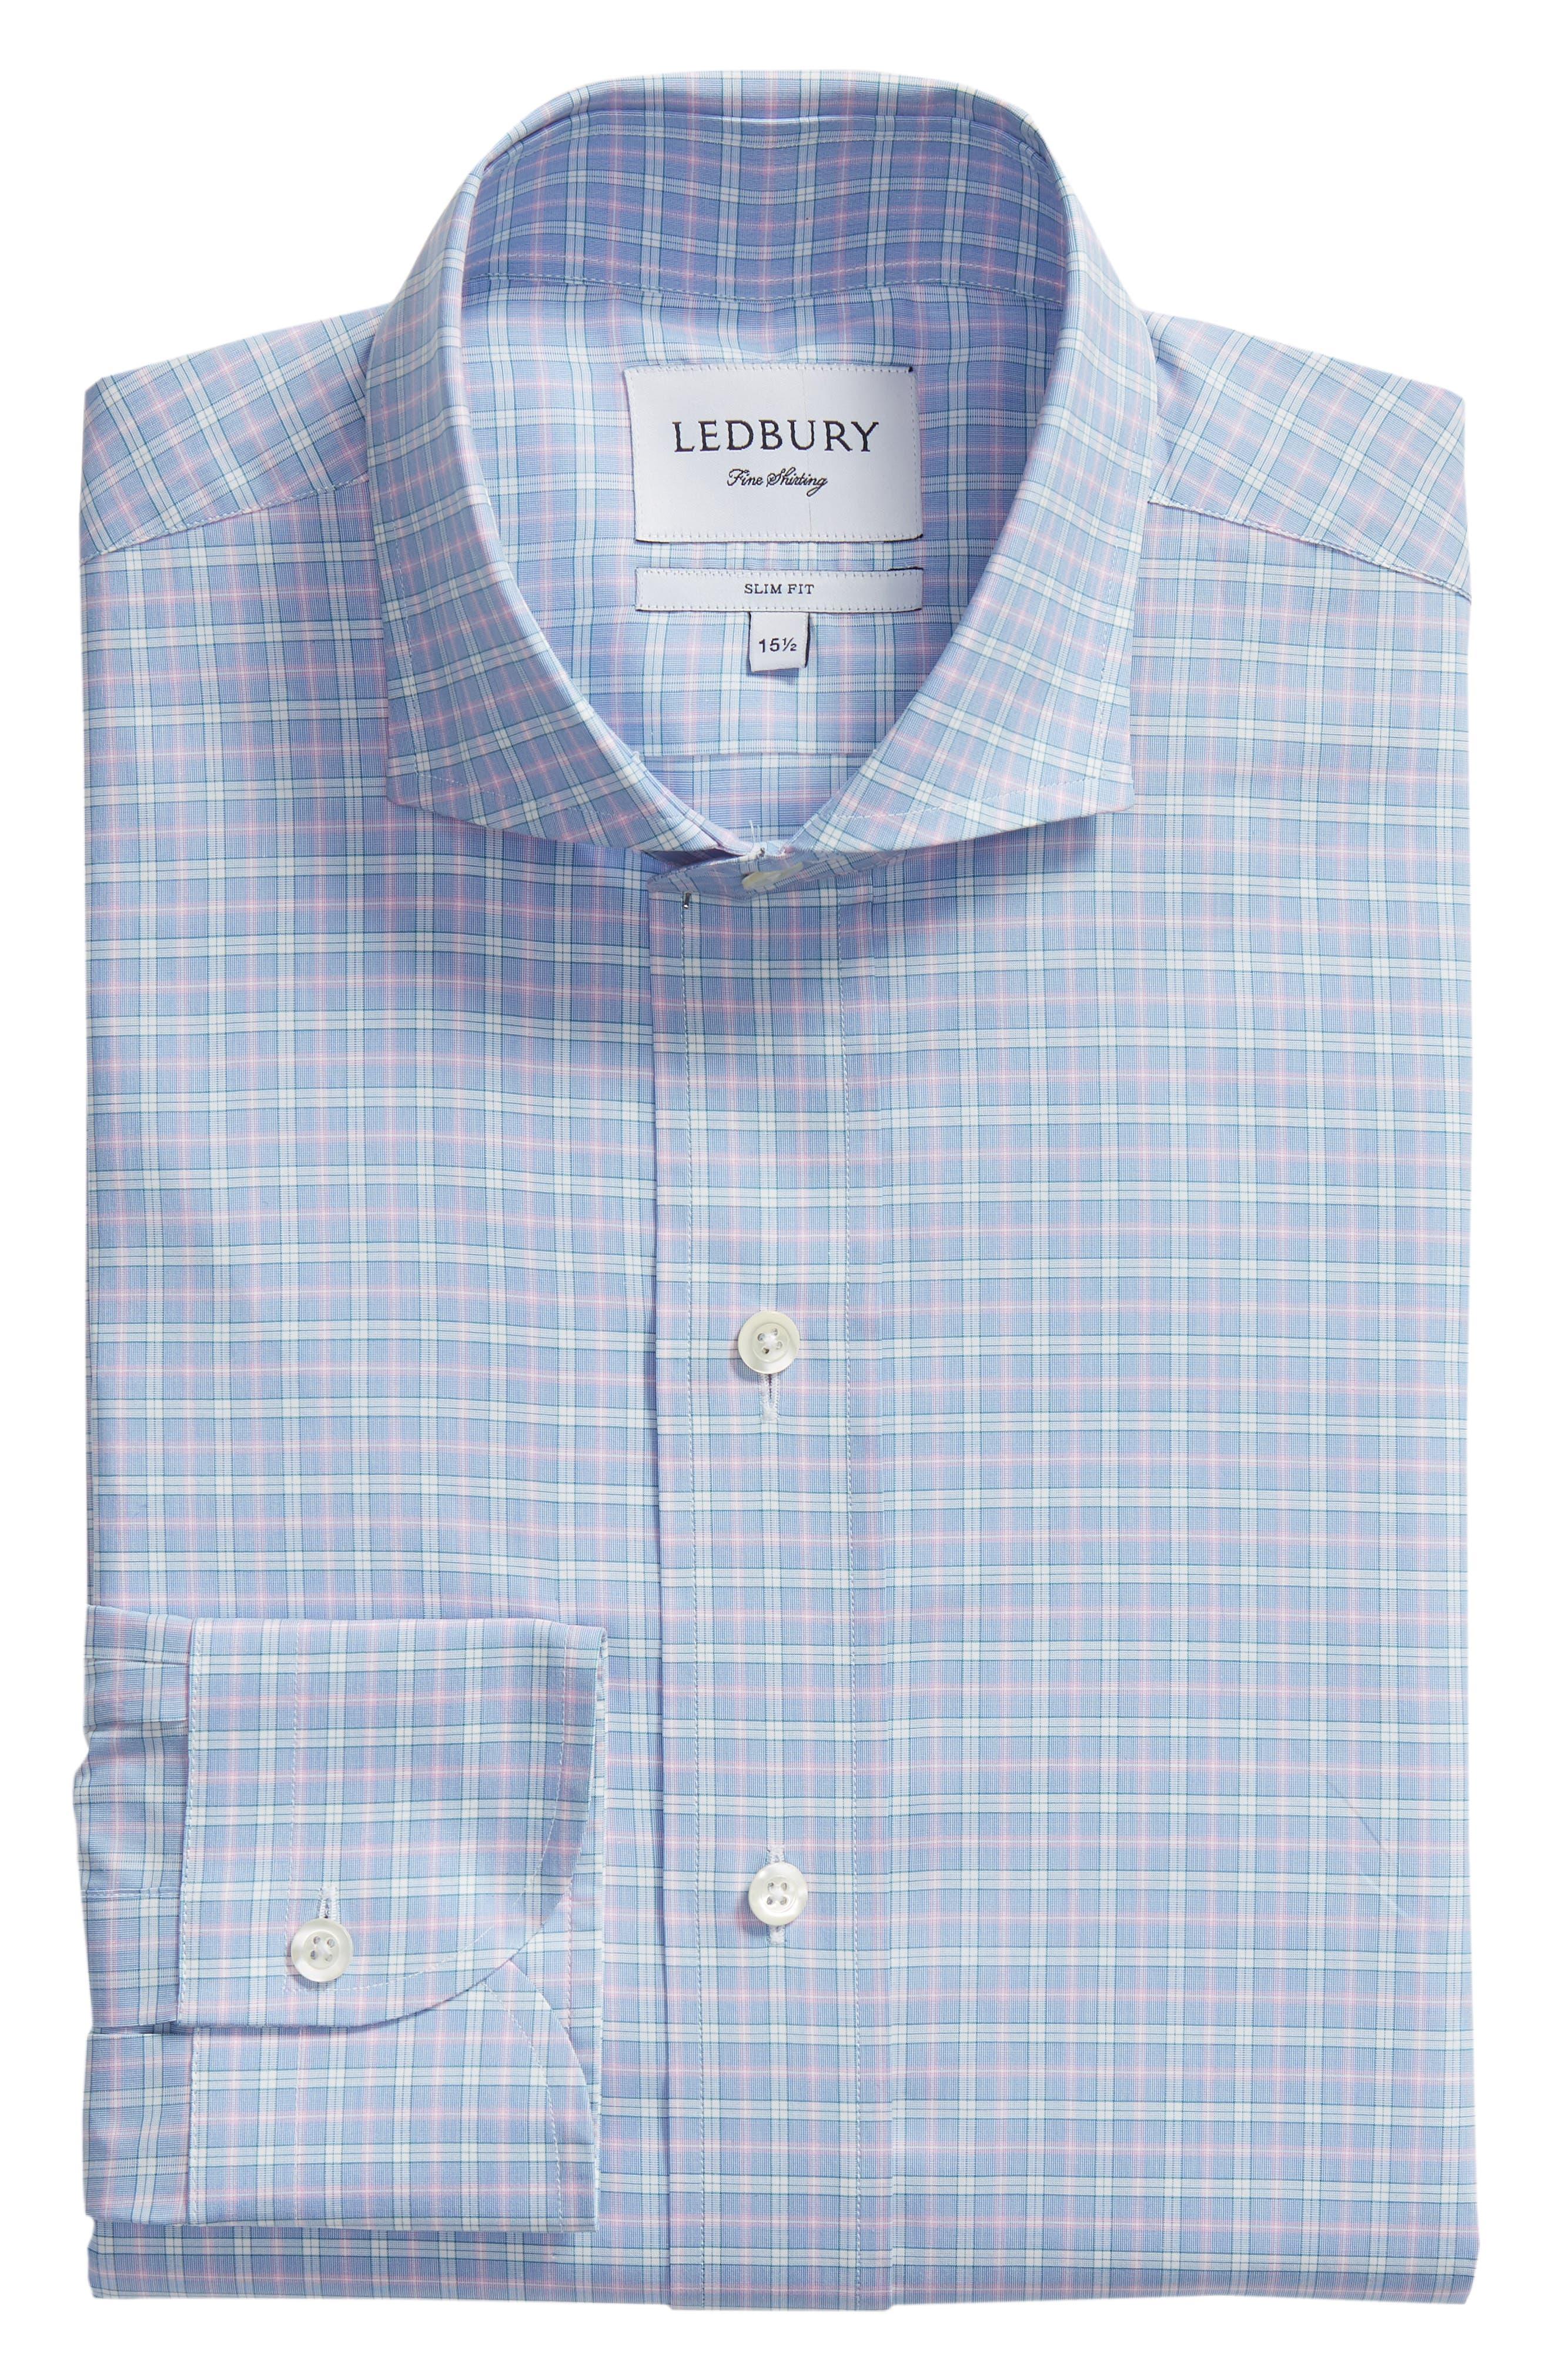 Ferris Slim Fit Check Dress Shirt,                             Alternate thumbnail 5, color,                             LIGHT/ PASTEL BLUE